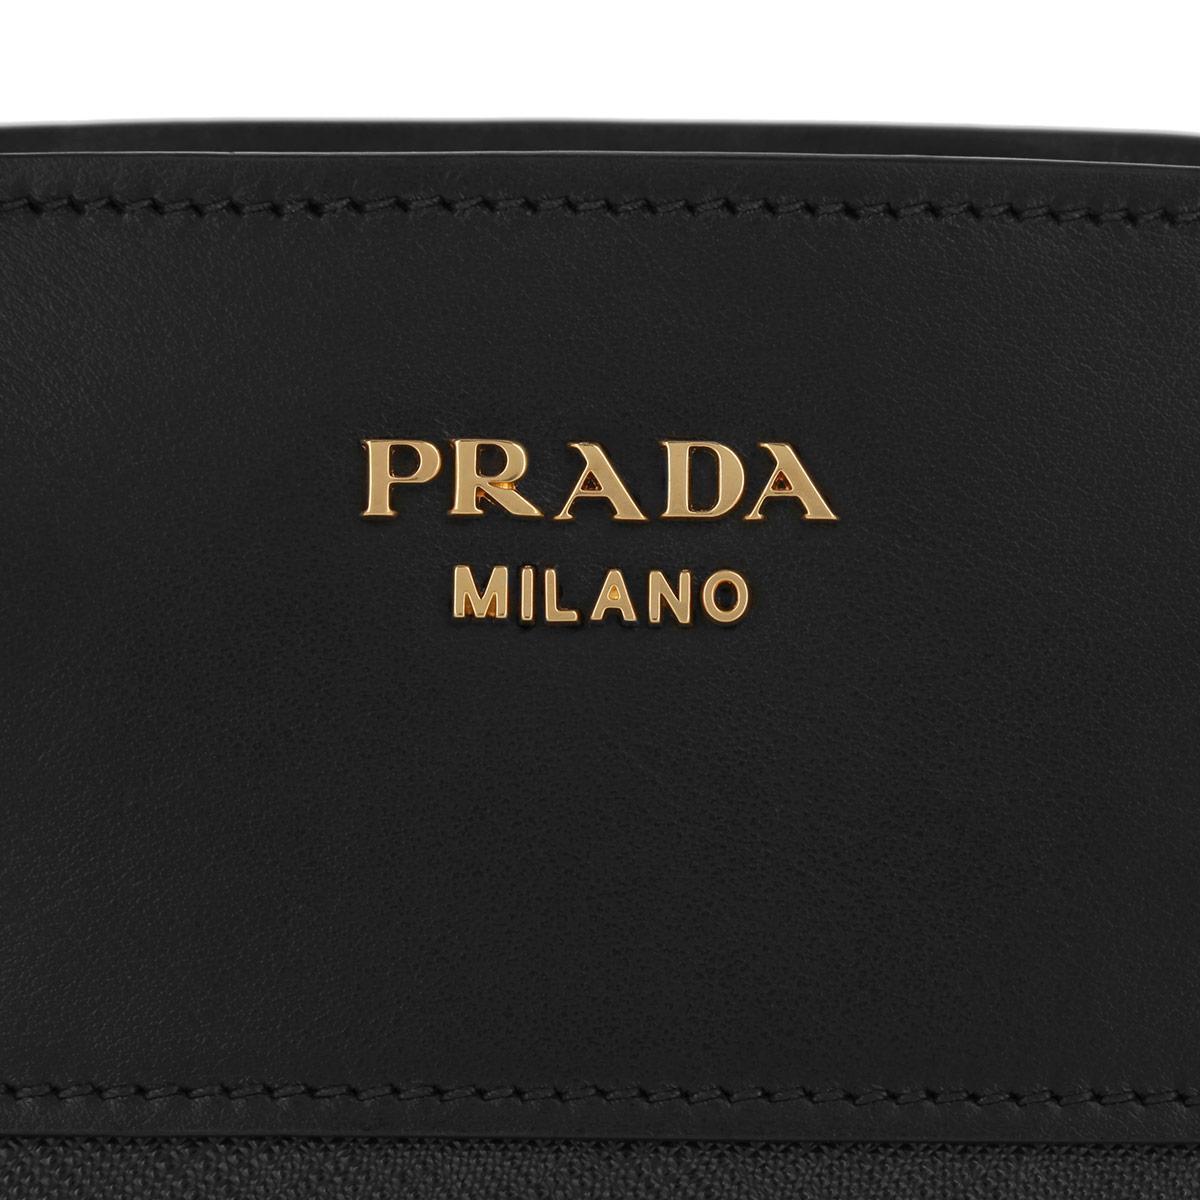 ecea2008d9d3 Prada Esplanade Borsa A Mano Saffiano City Tote Bag Nero in Black - Lyst